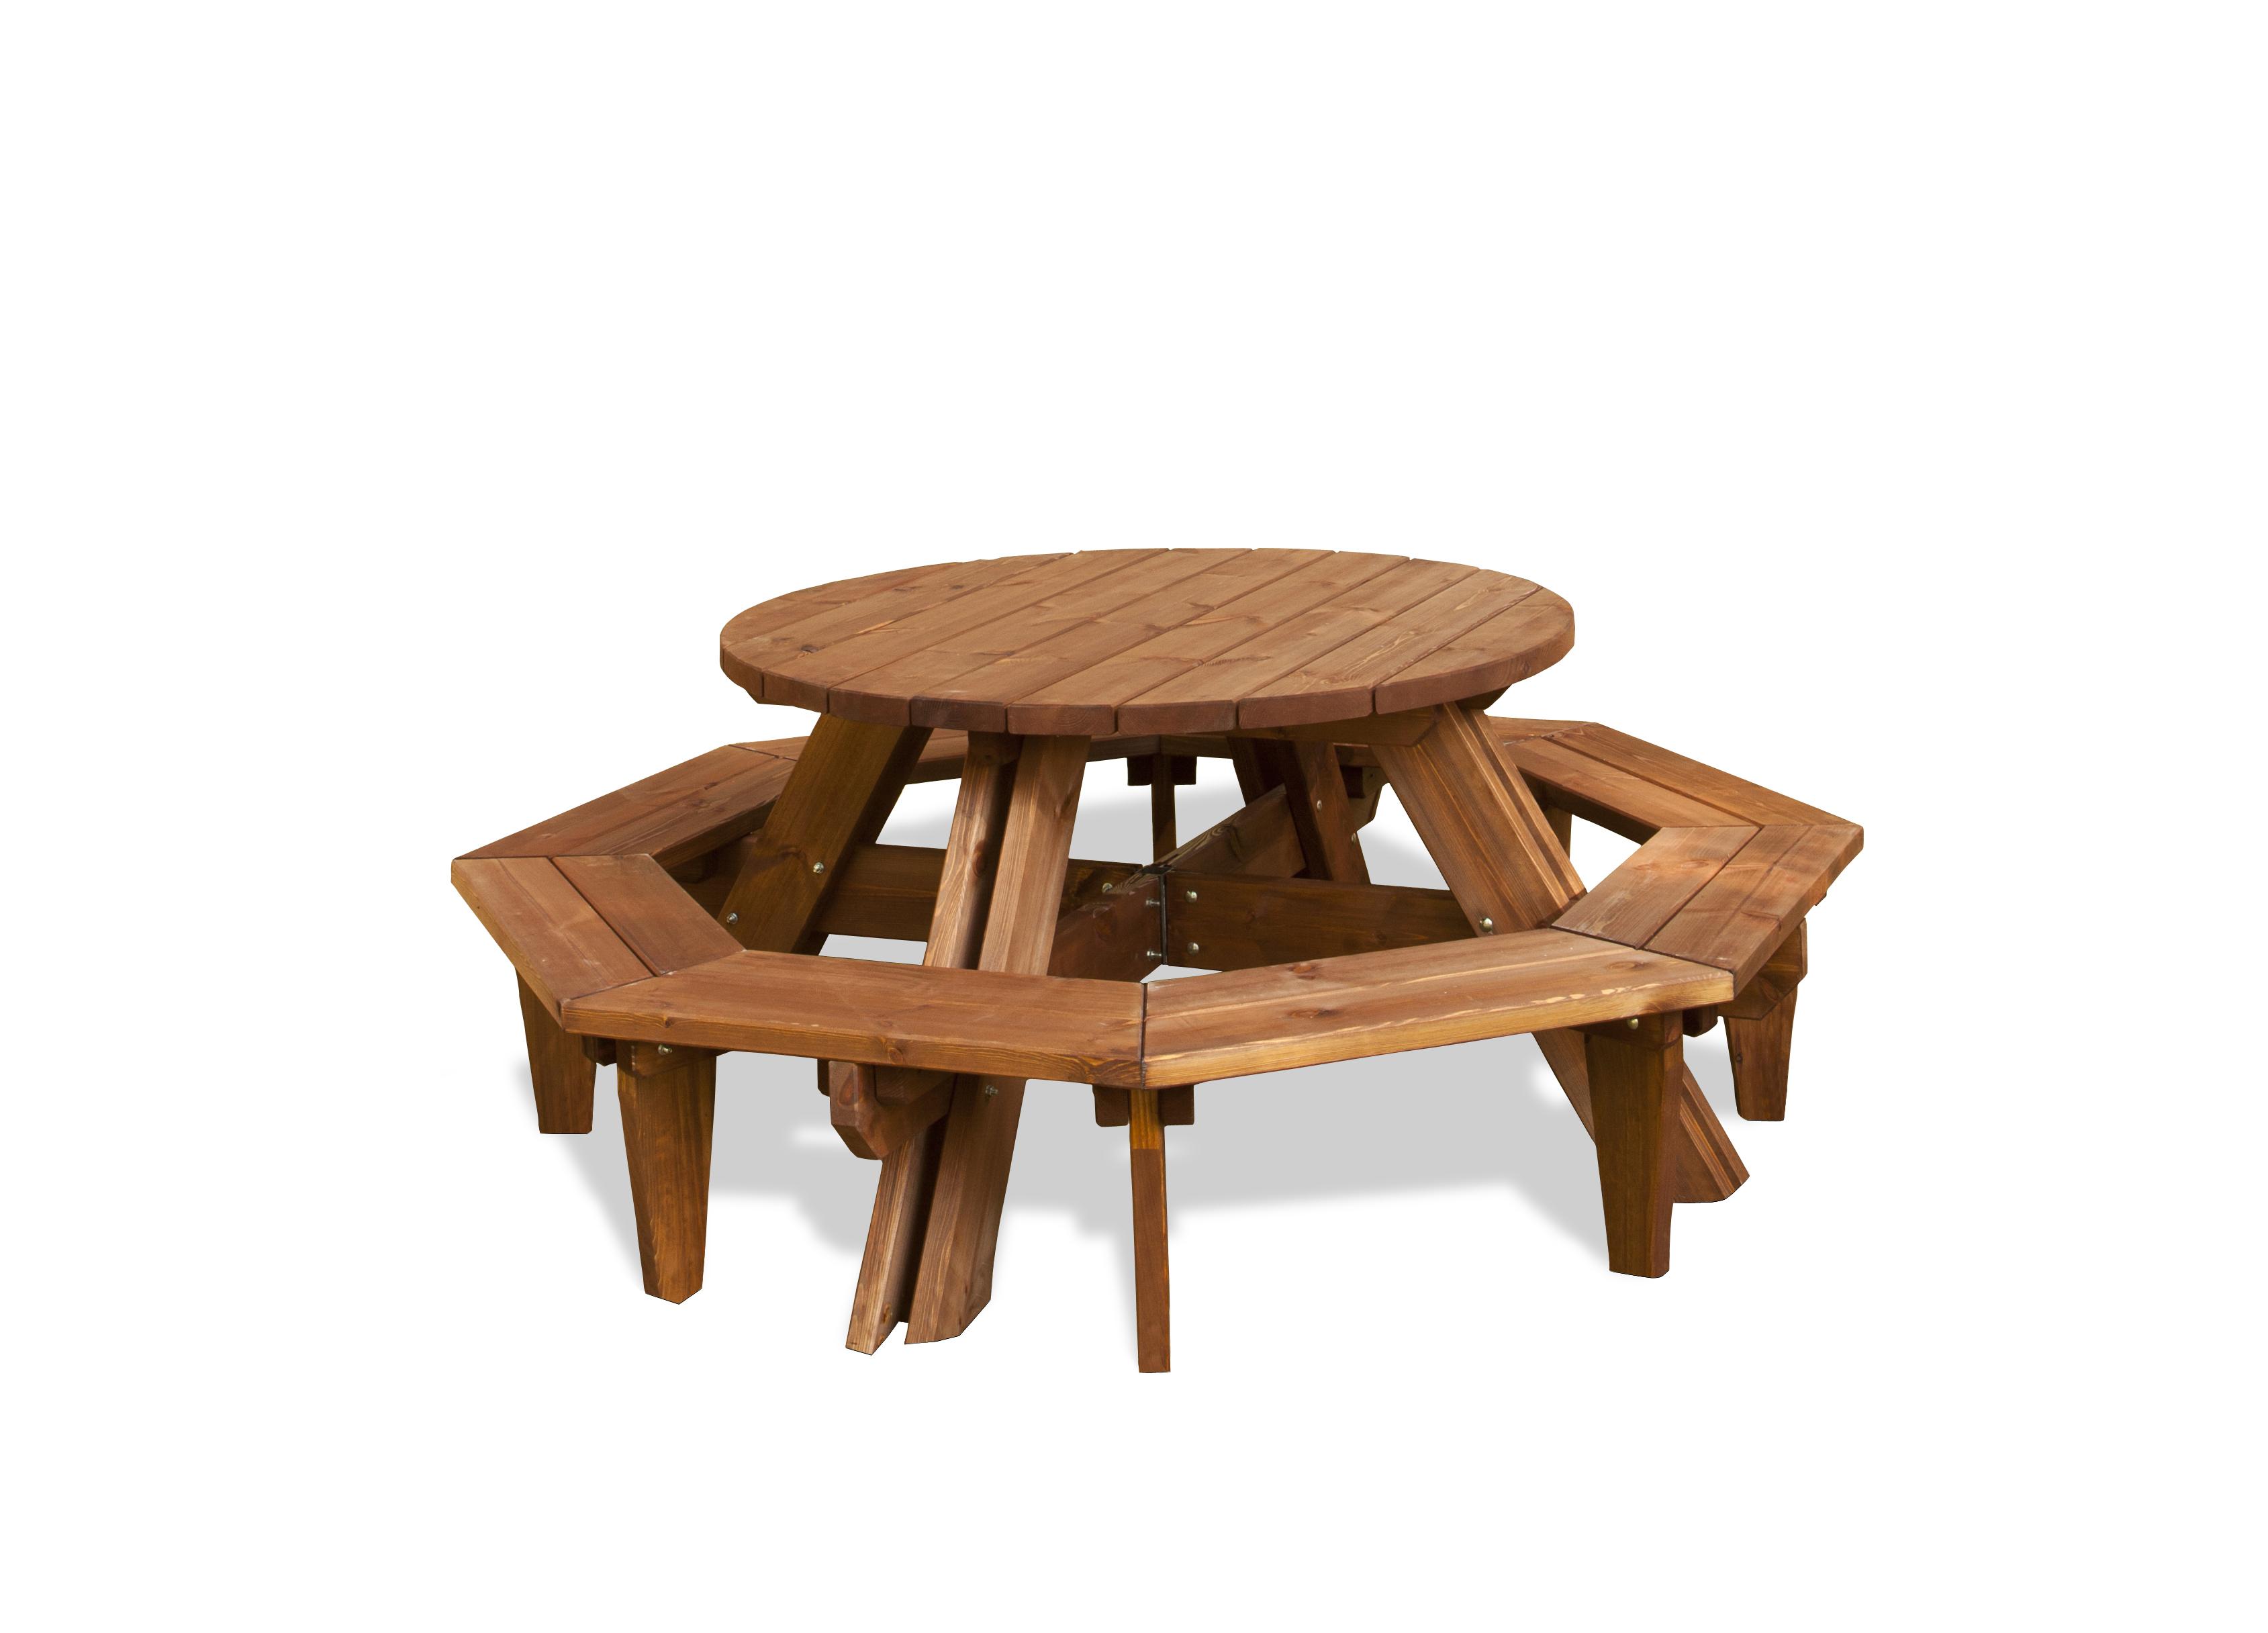 Mesa madera redonda jardin images - Mesas de madera para exterior ...